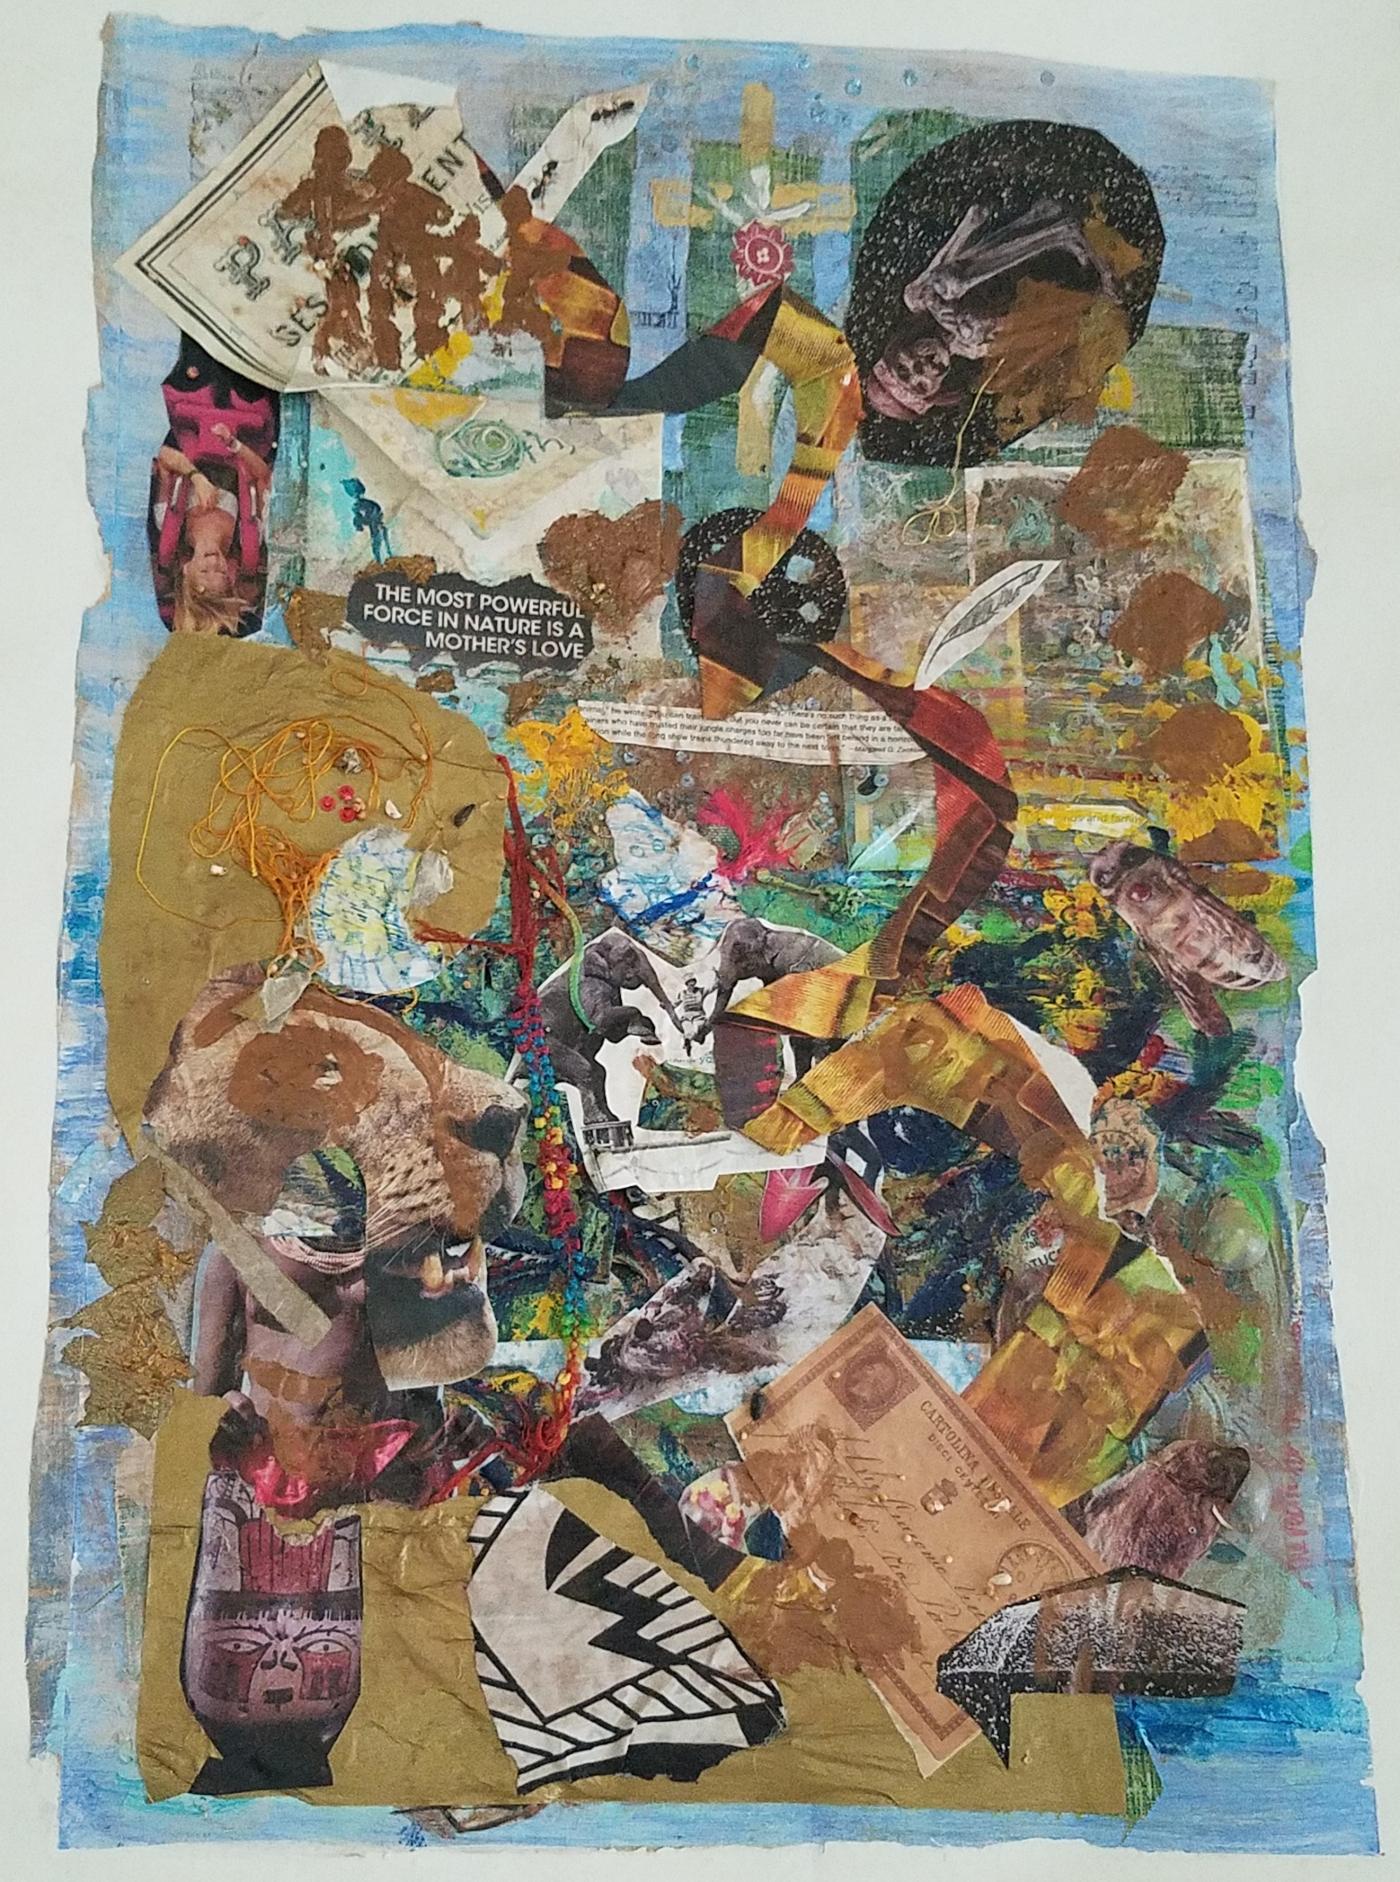 Daftar Harga Ipi Volume 8 Issue 1 By Pharma Publications Issuu Cerruti Cra133sbu02bk Hitam Ring Silver Literaryjournal The Cabinet Of Heed Making Amy